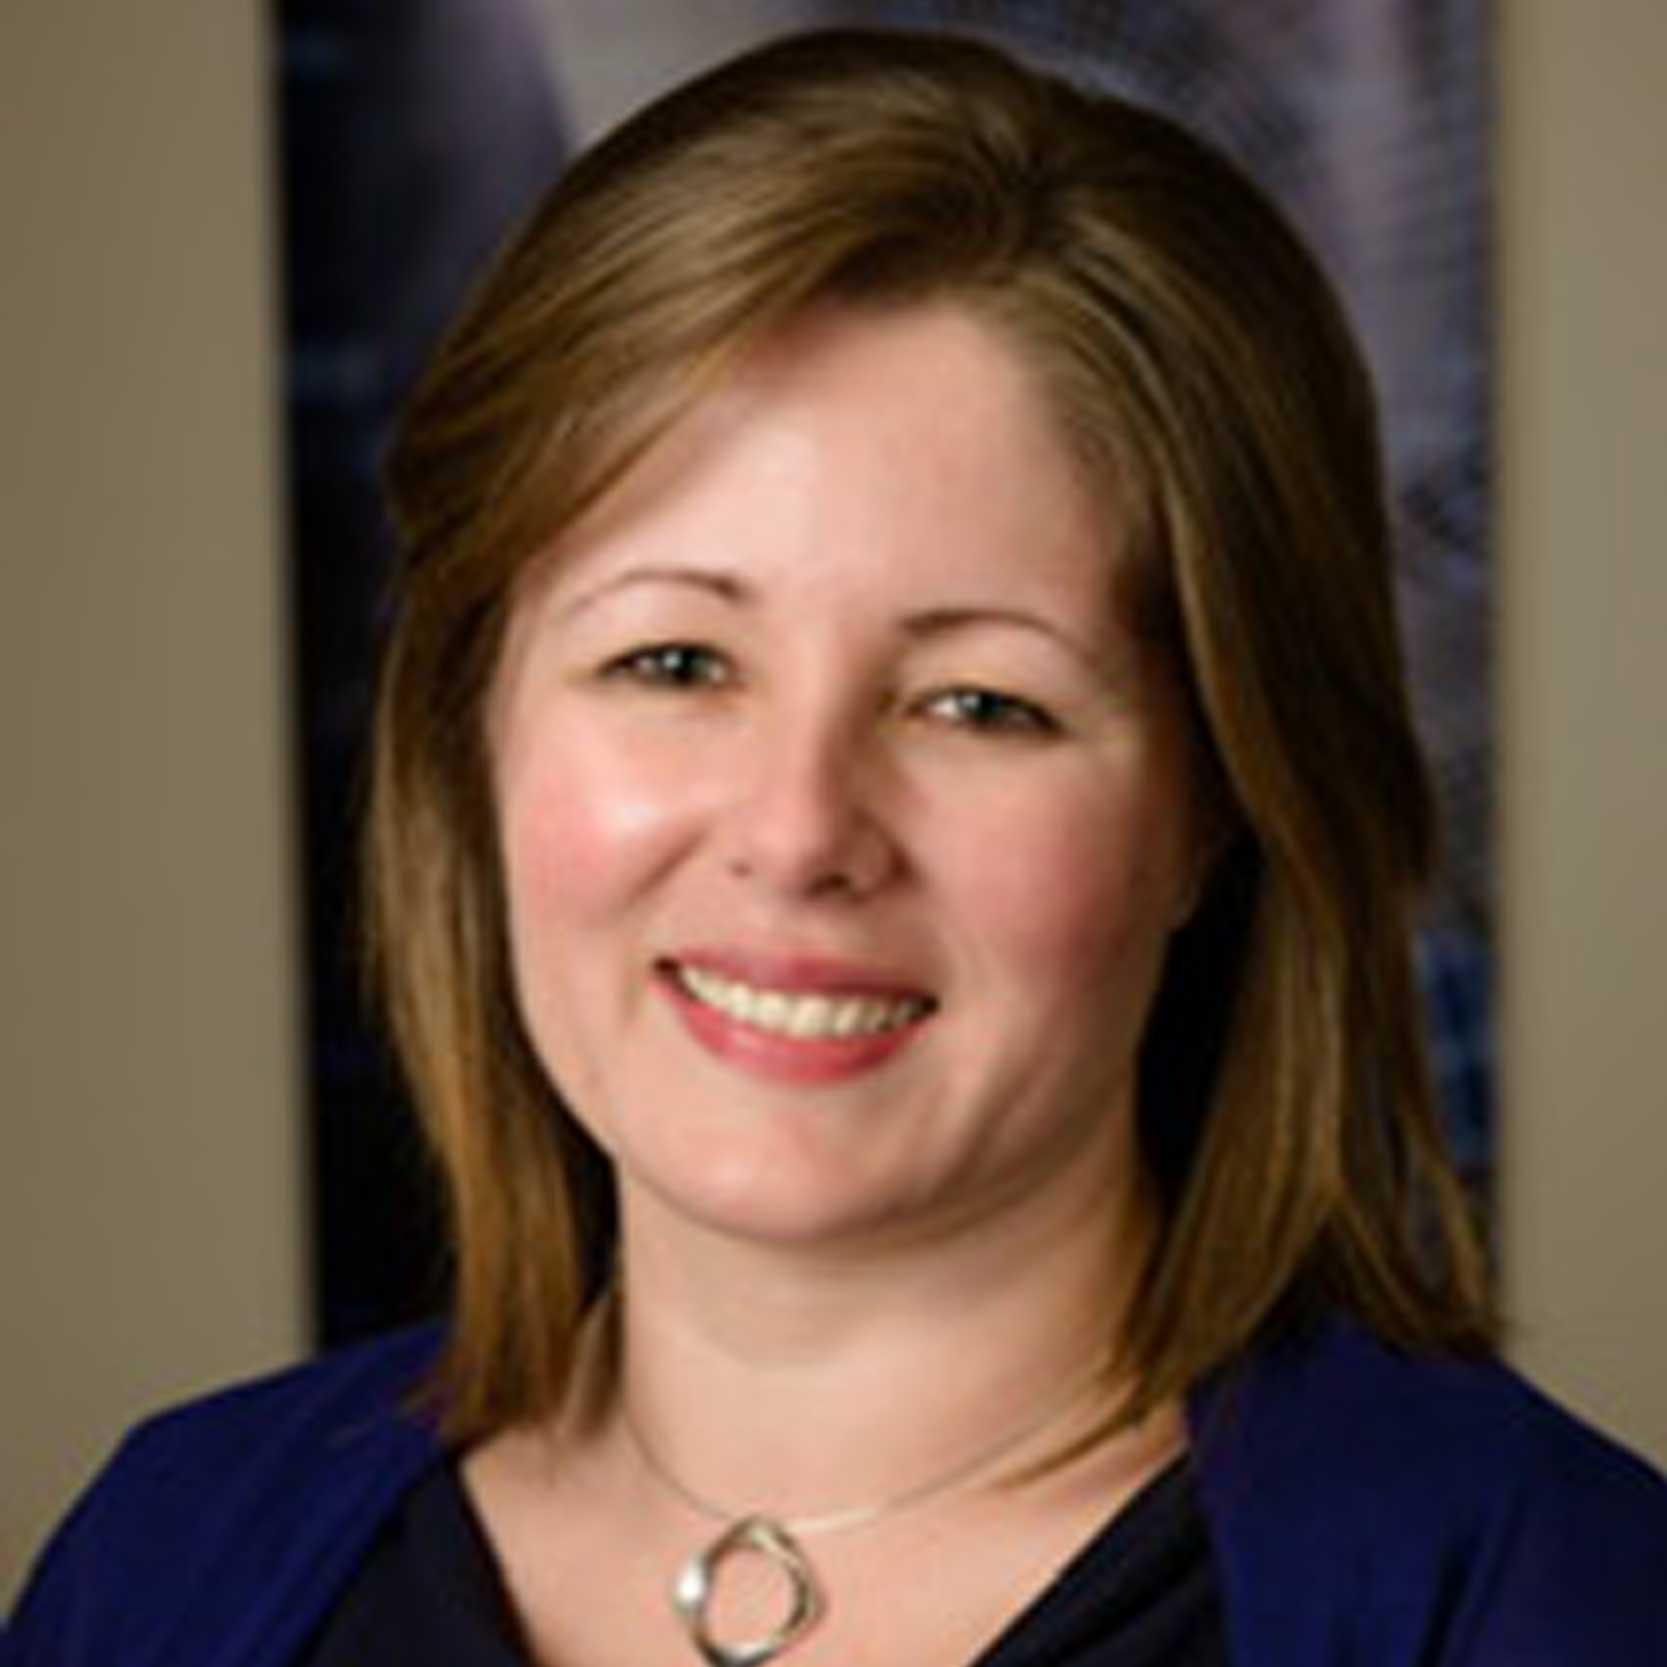 Tanya Shields